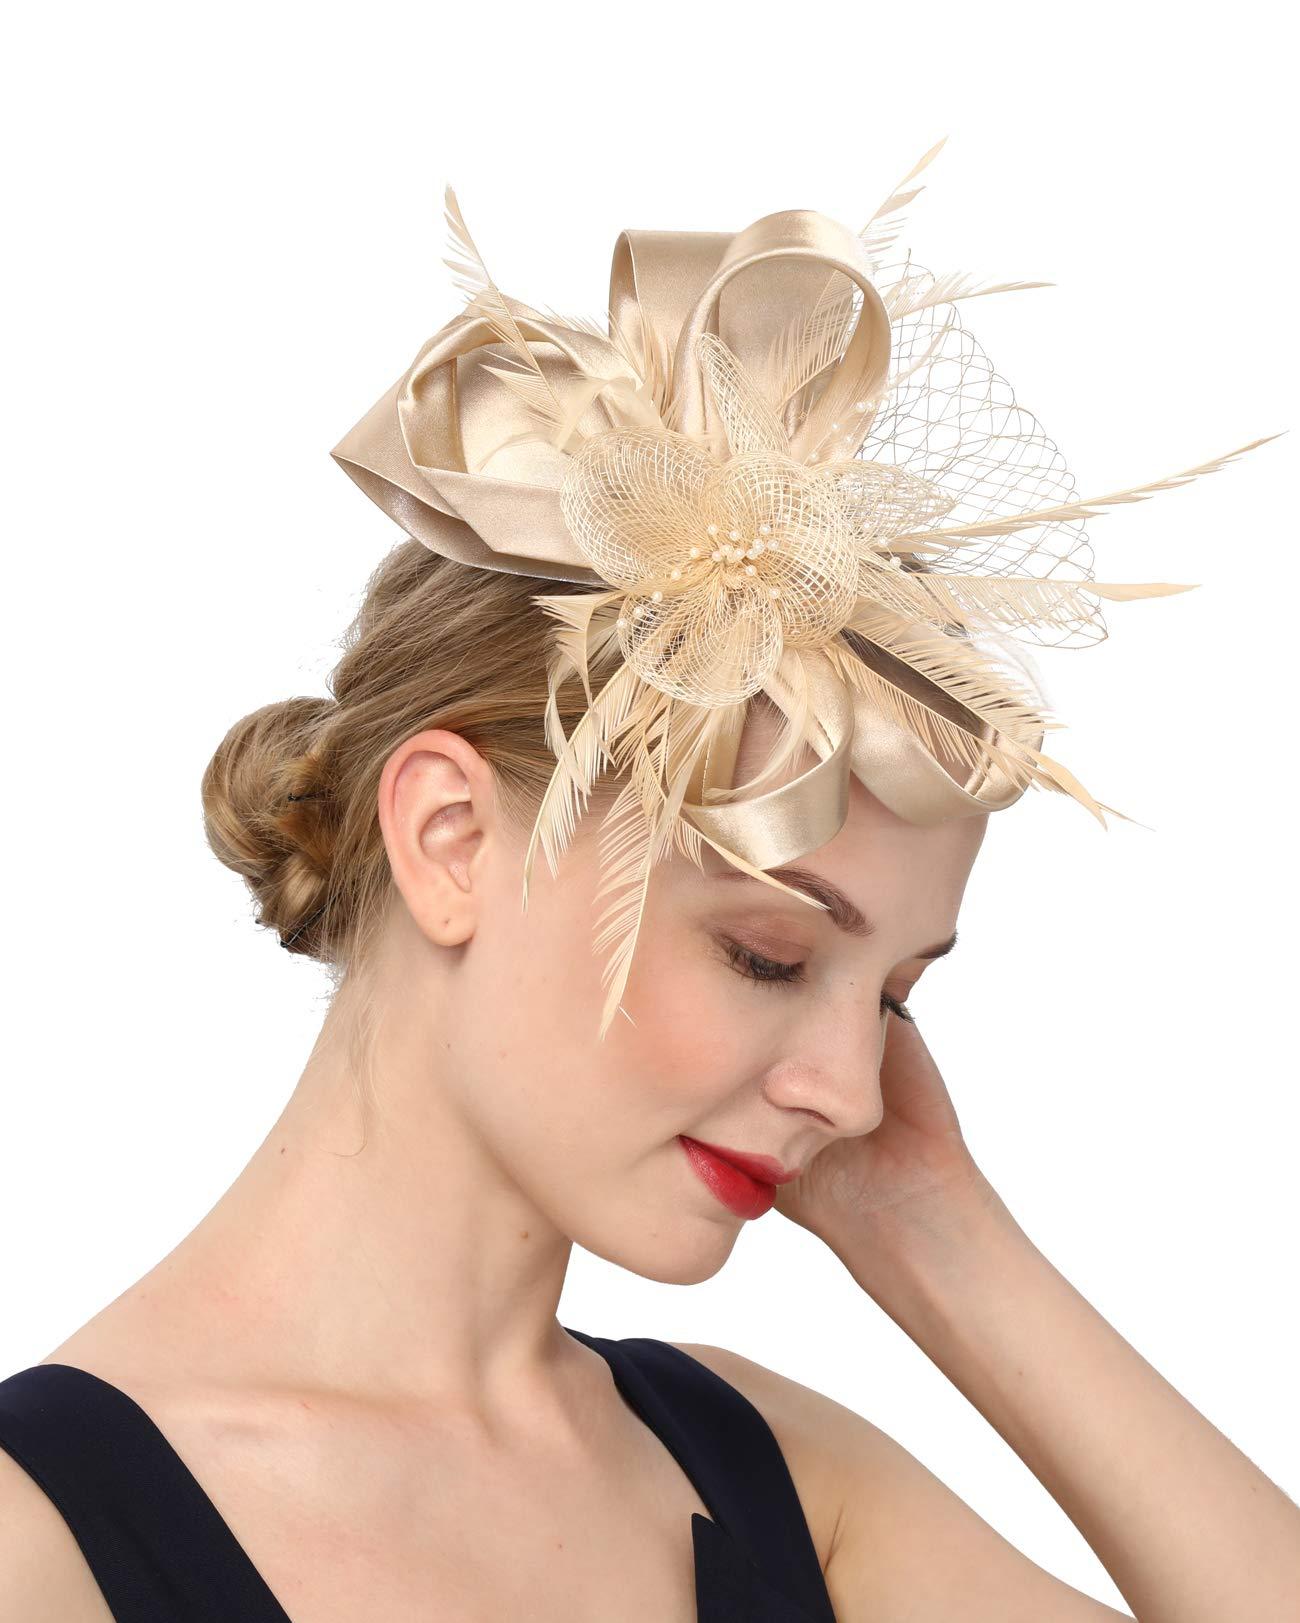 Women's Fascinators Hat Hair Clip Feather Wedding Headware Bridal 1920s Headpiece (S4-champagne) by Cizoe